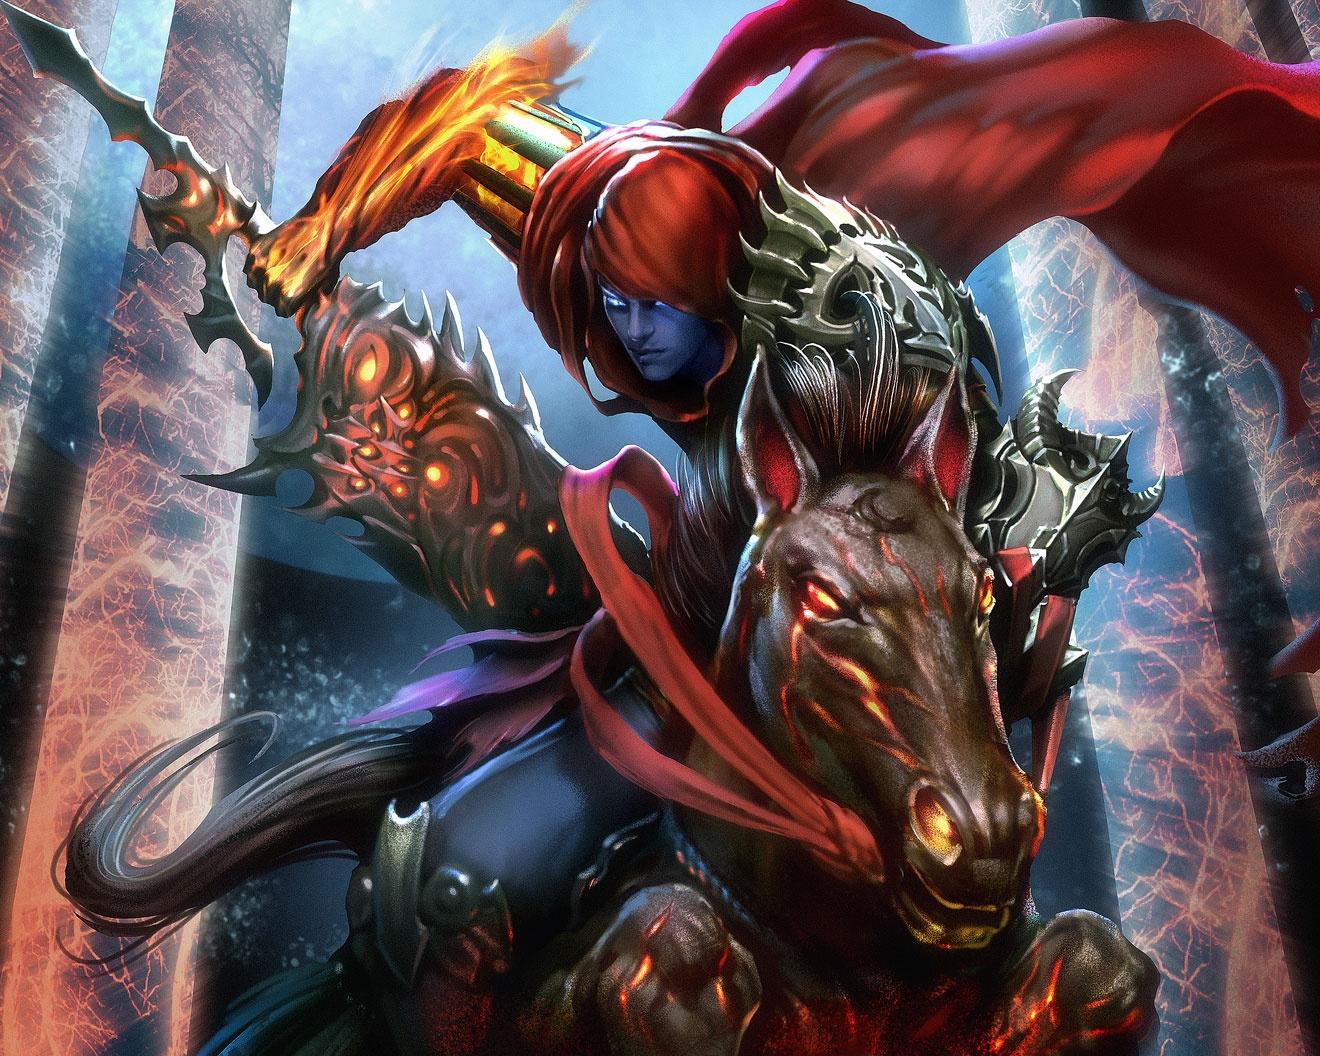 Картинки Мечи Лошади Воители воин с гигантским мечом на коне Фэнтези воины Фантастика